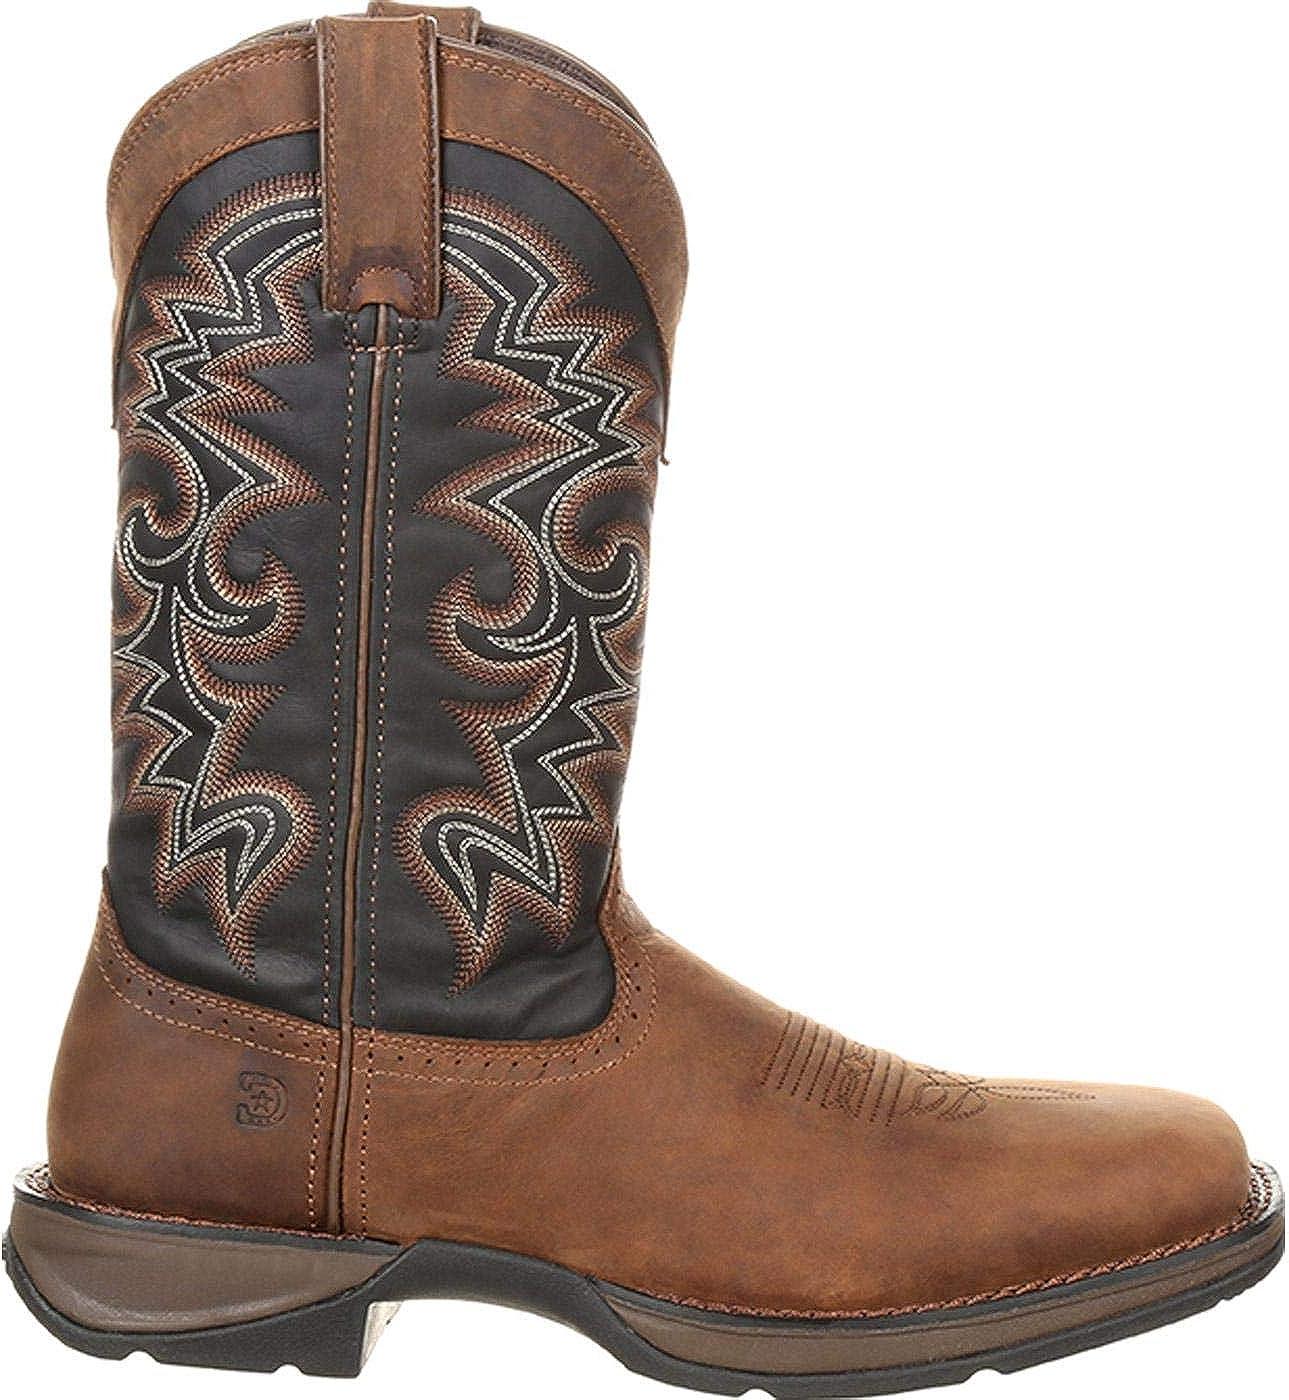 Durango Rebel Pull-On Western Boot 71LQ7DstCvL